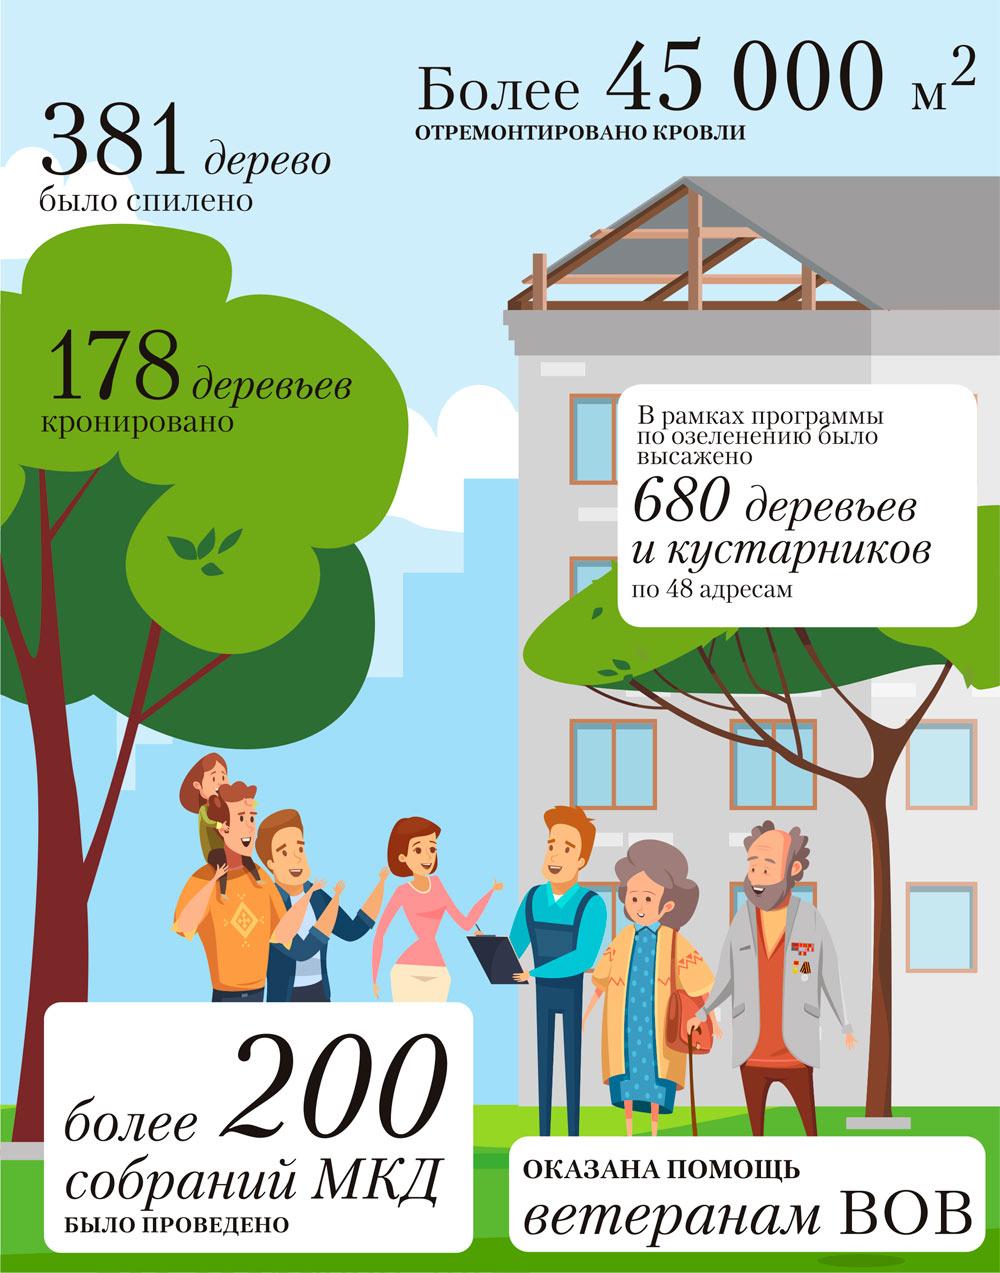 infografika_december2019_1000x1000_1